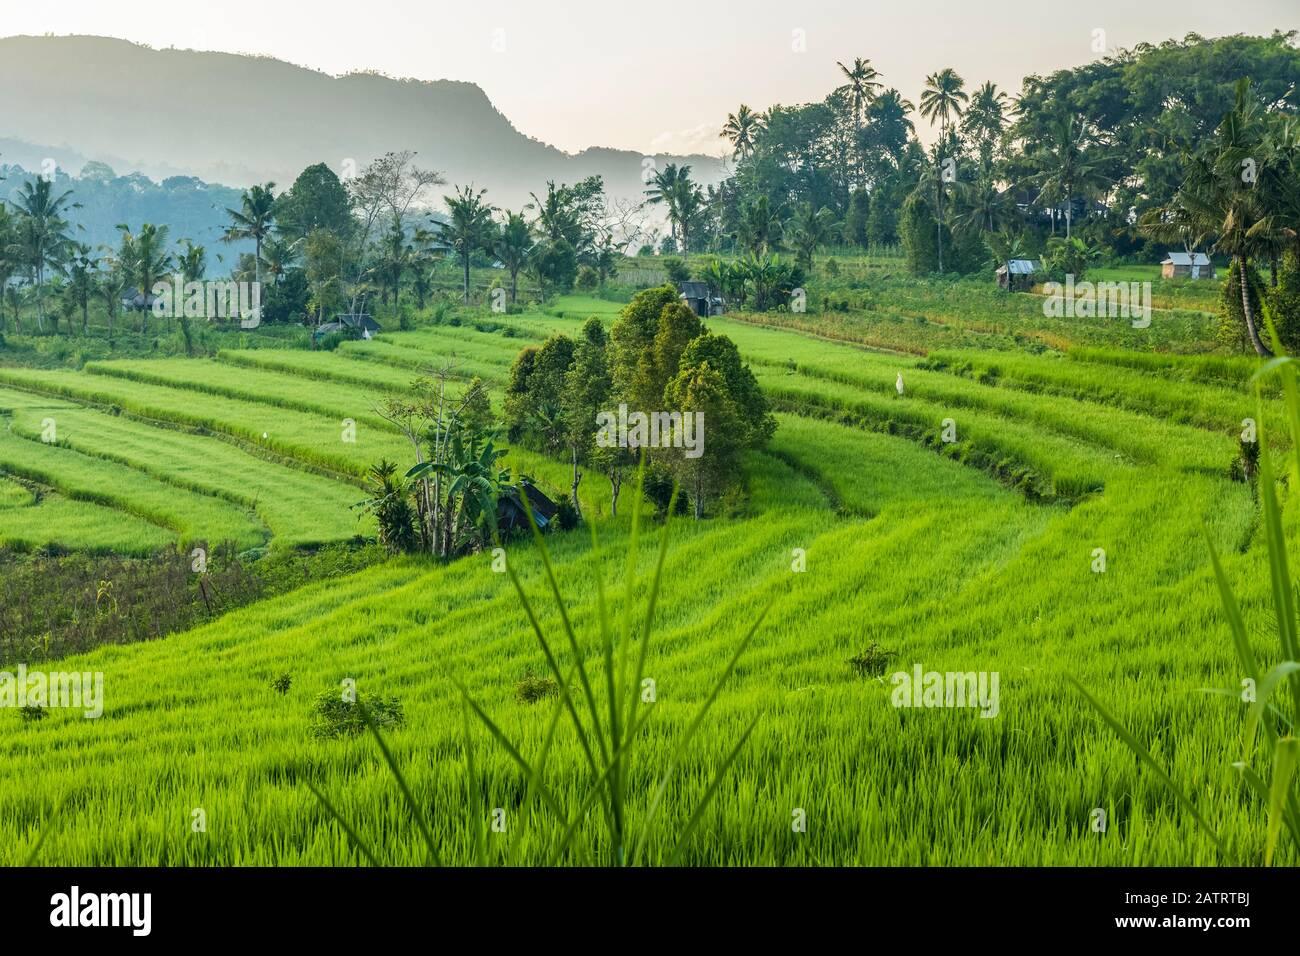 Sunrise at Sideman Rice Terraces; Bali, Indonesia Stock Photo